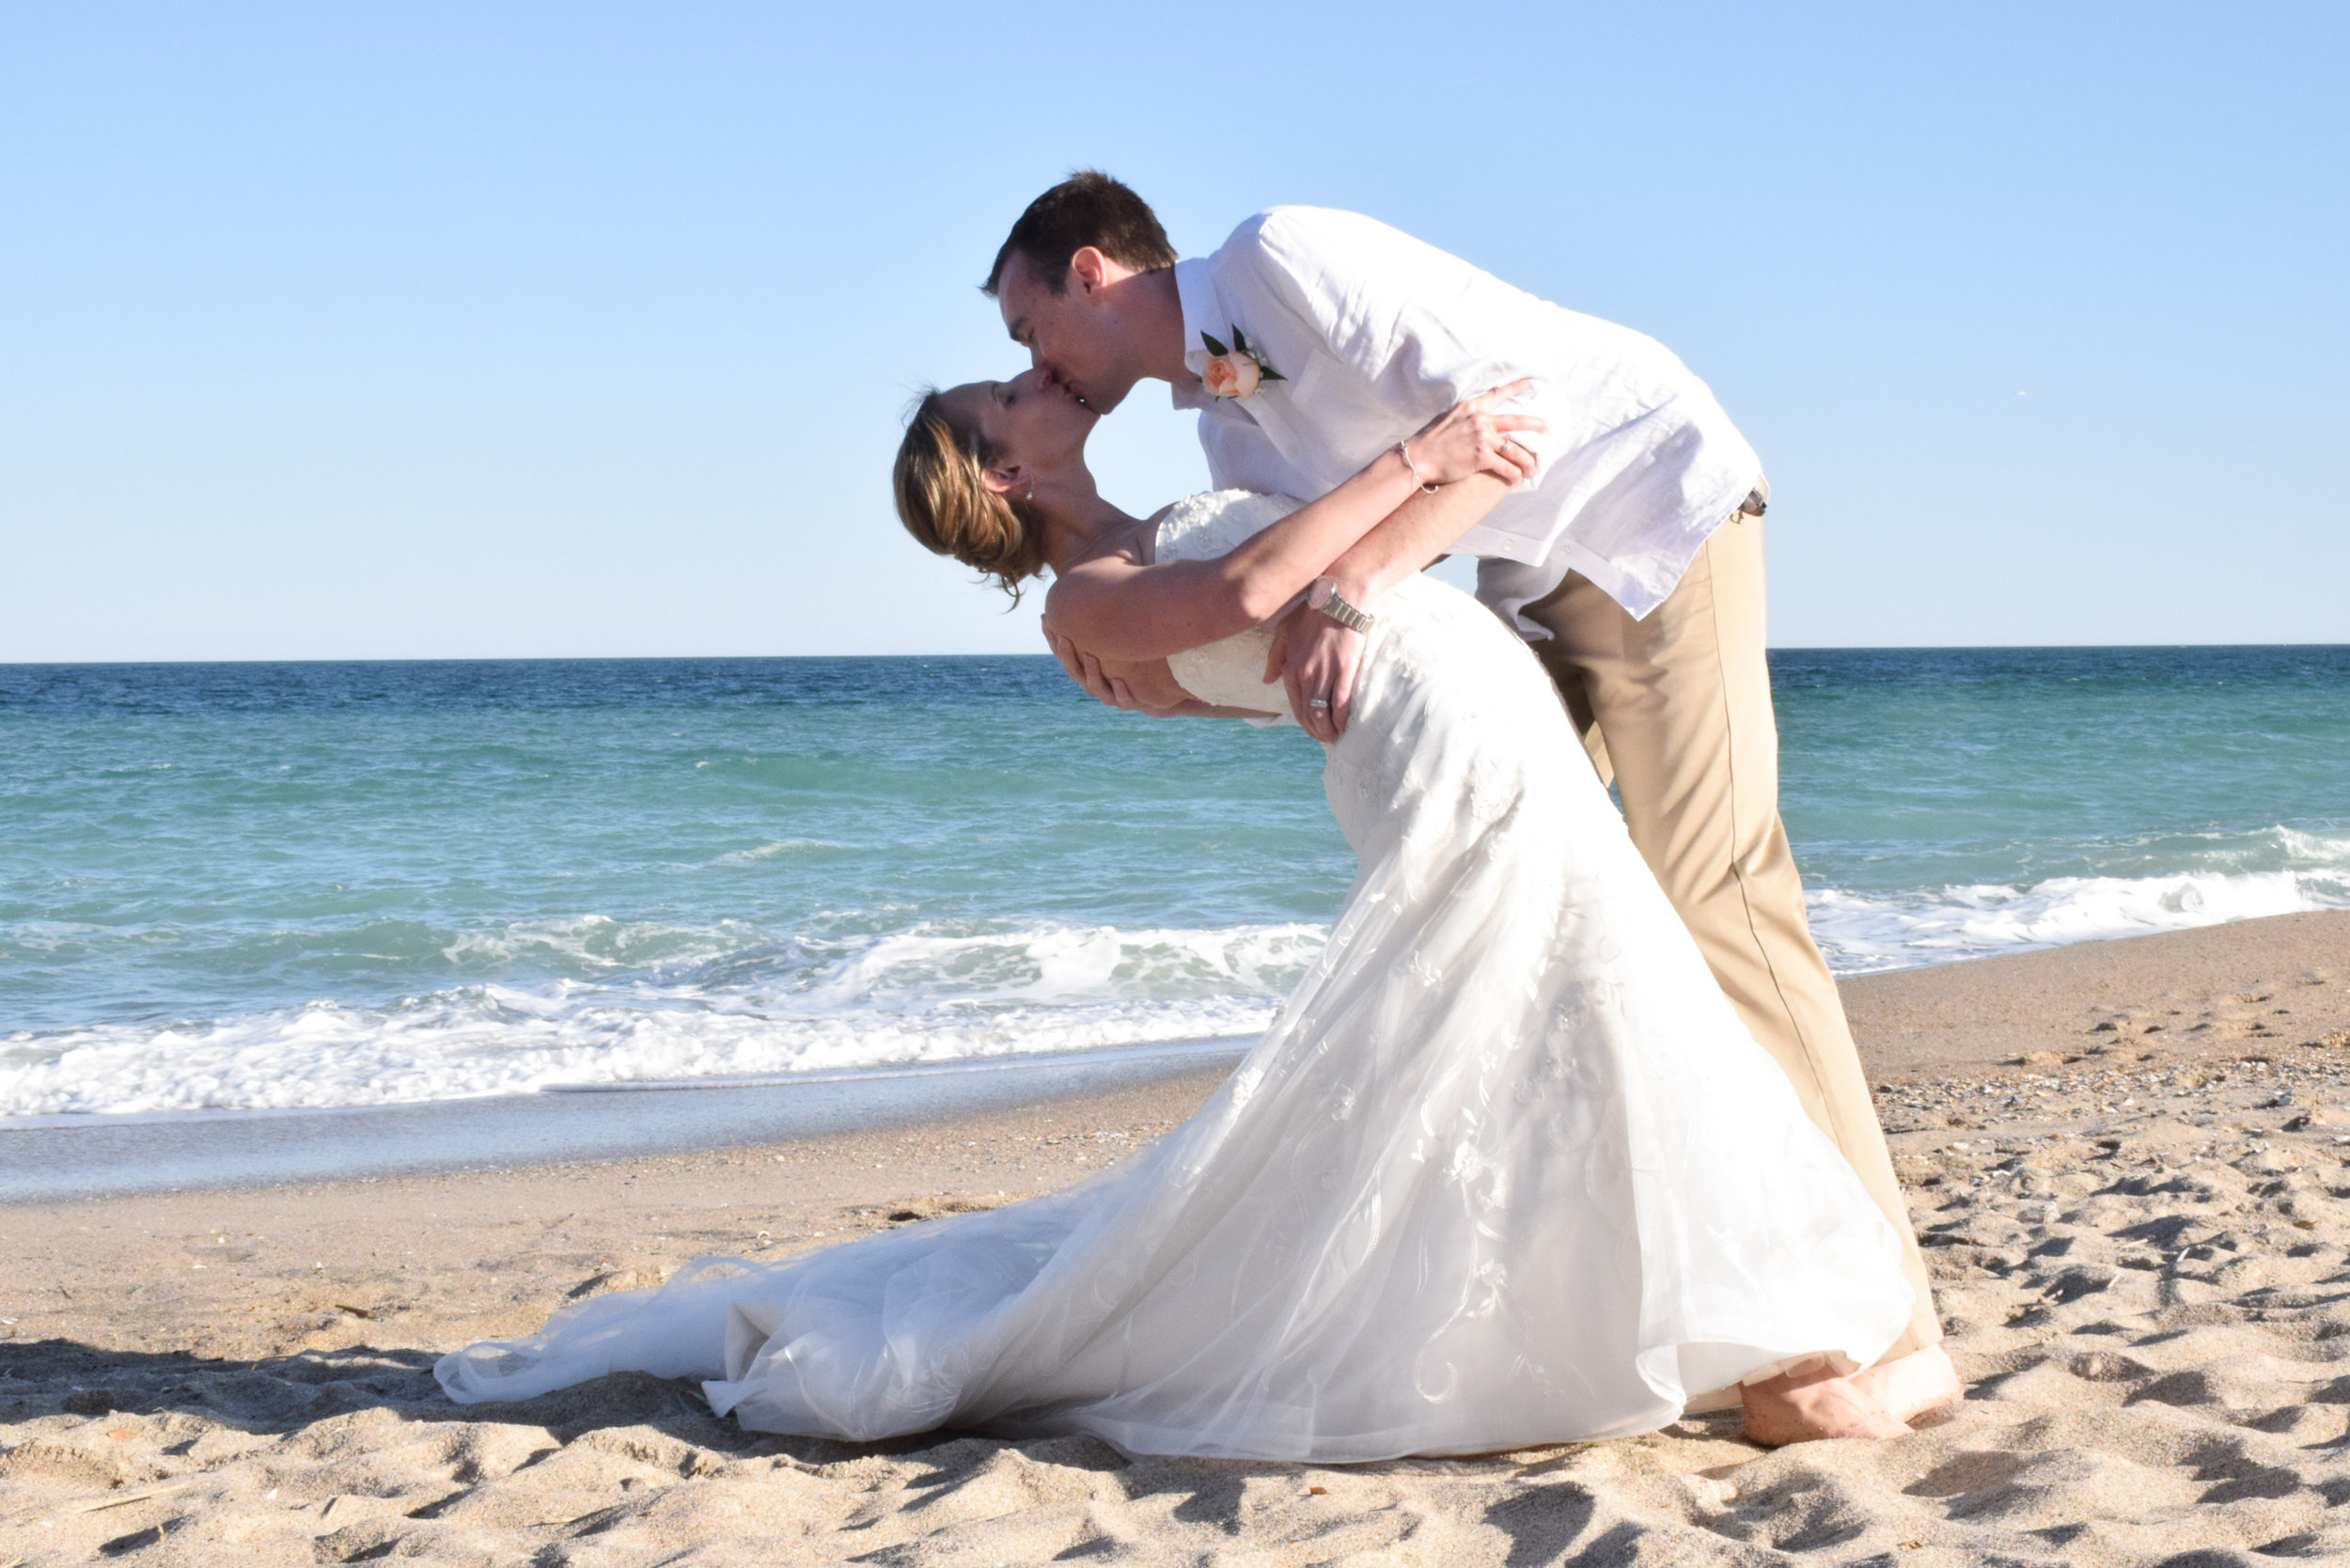 Groom dipping bride on beach.